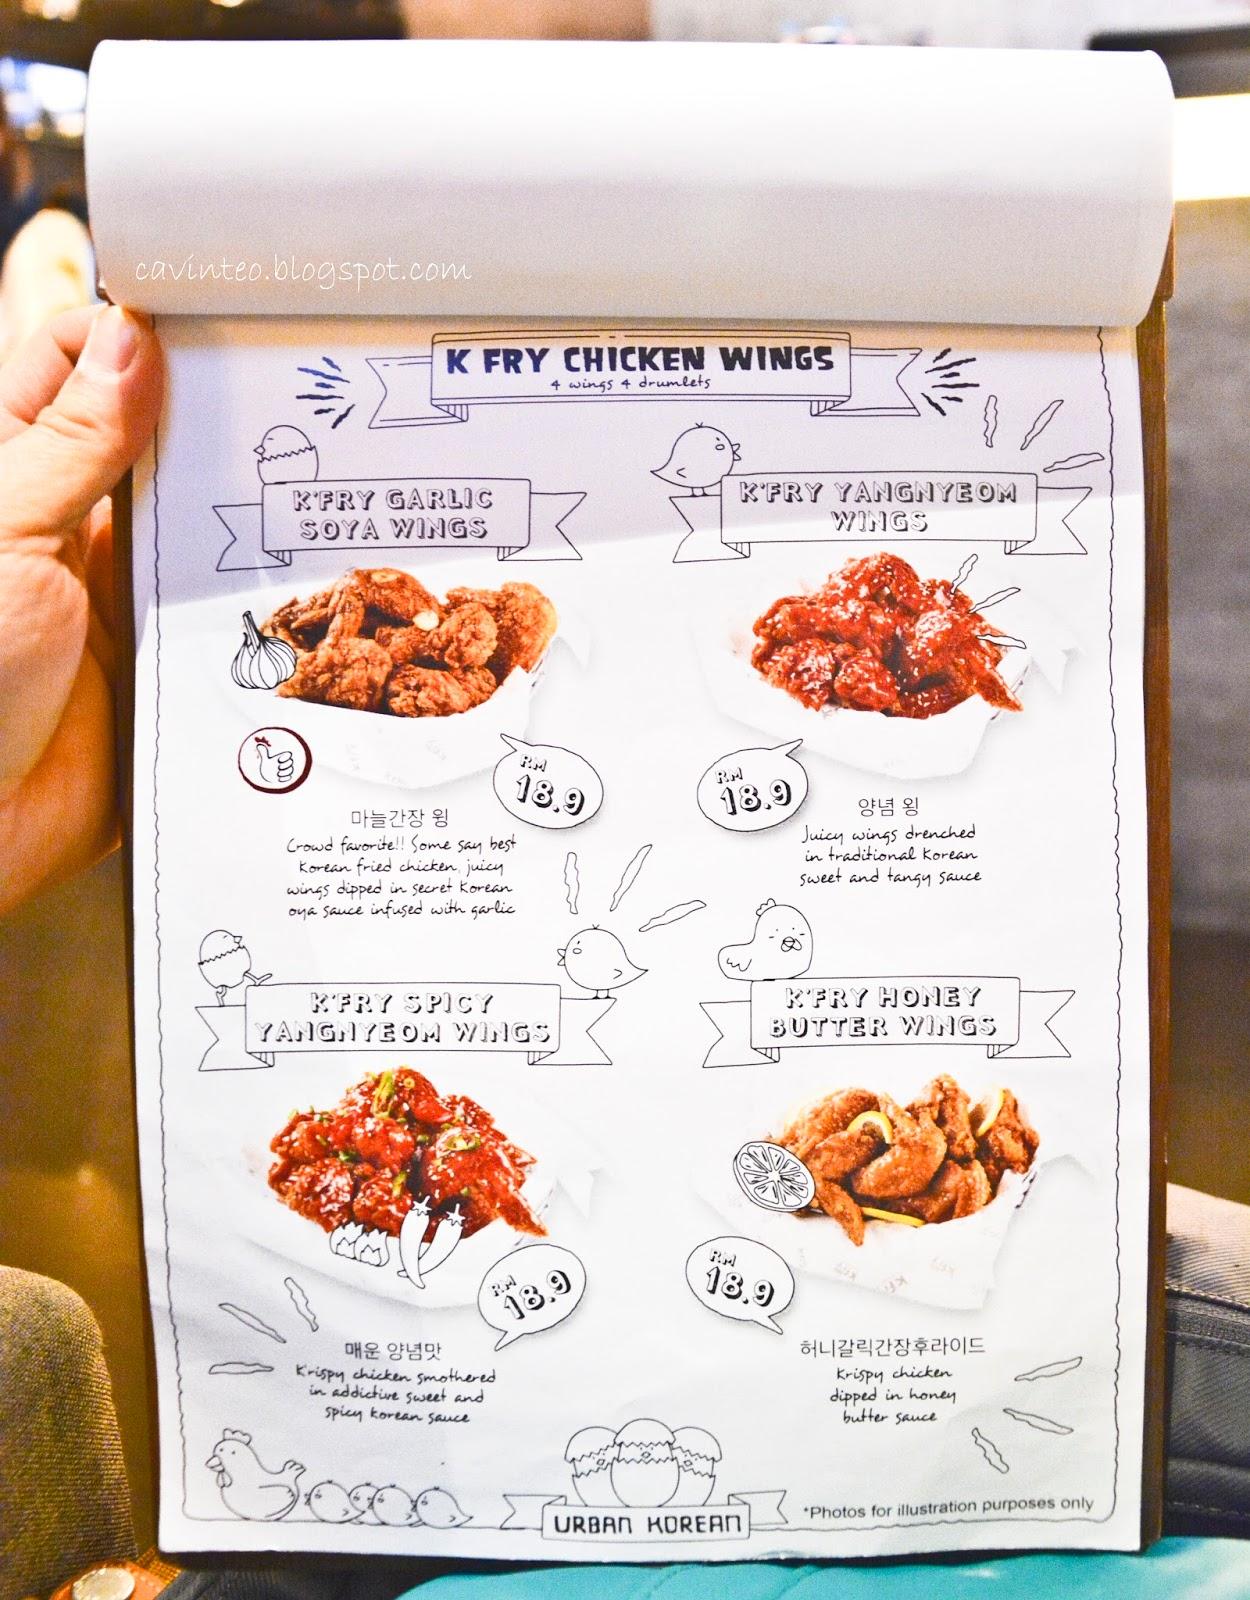 Entree Kibbles: KFry Urban Korean Fried Chicken - No Pork, No Lard ...